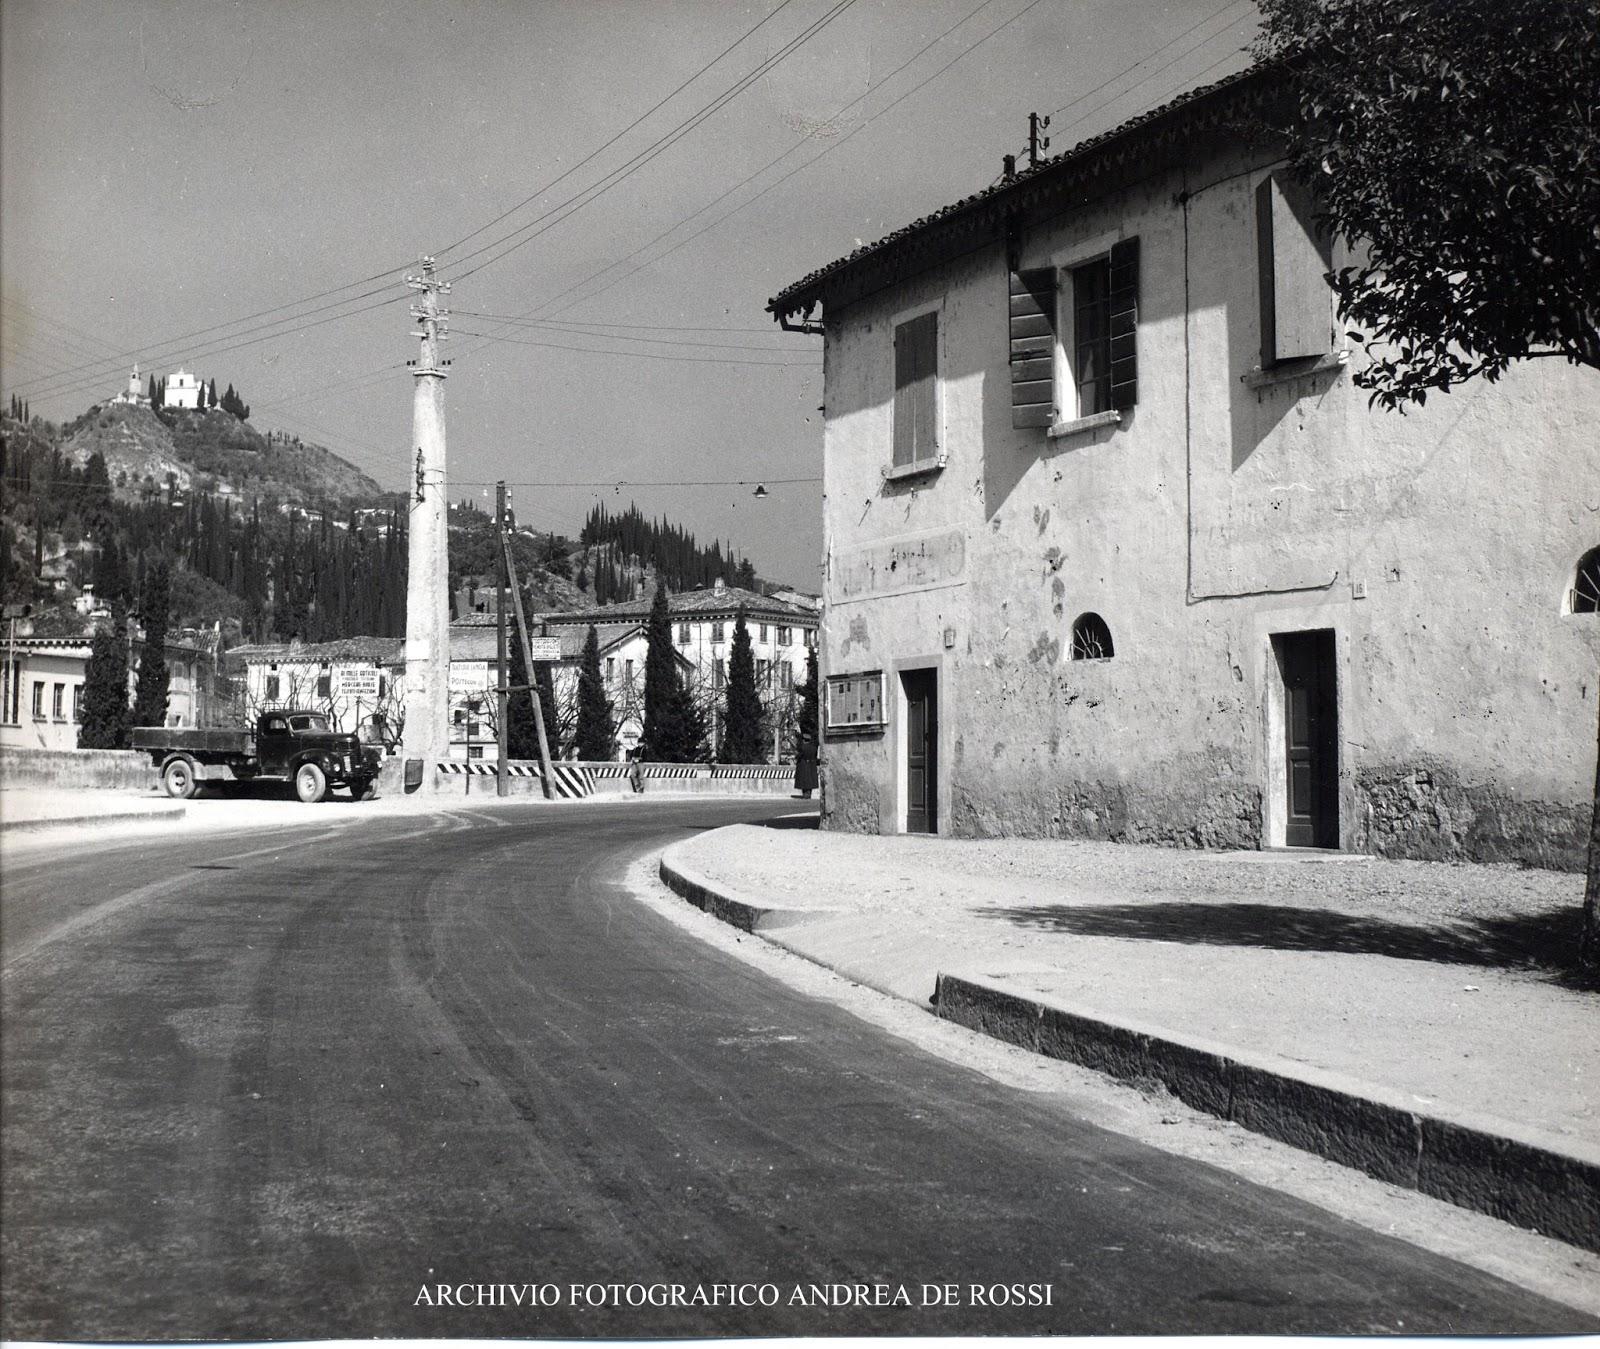 Storia Di Toscolano Maderno Casa Al Ponte Ora Demolita